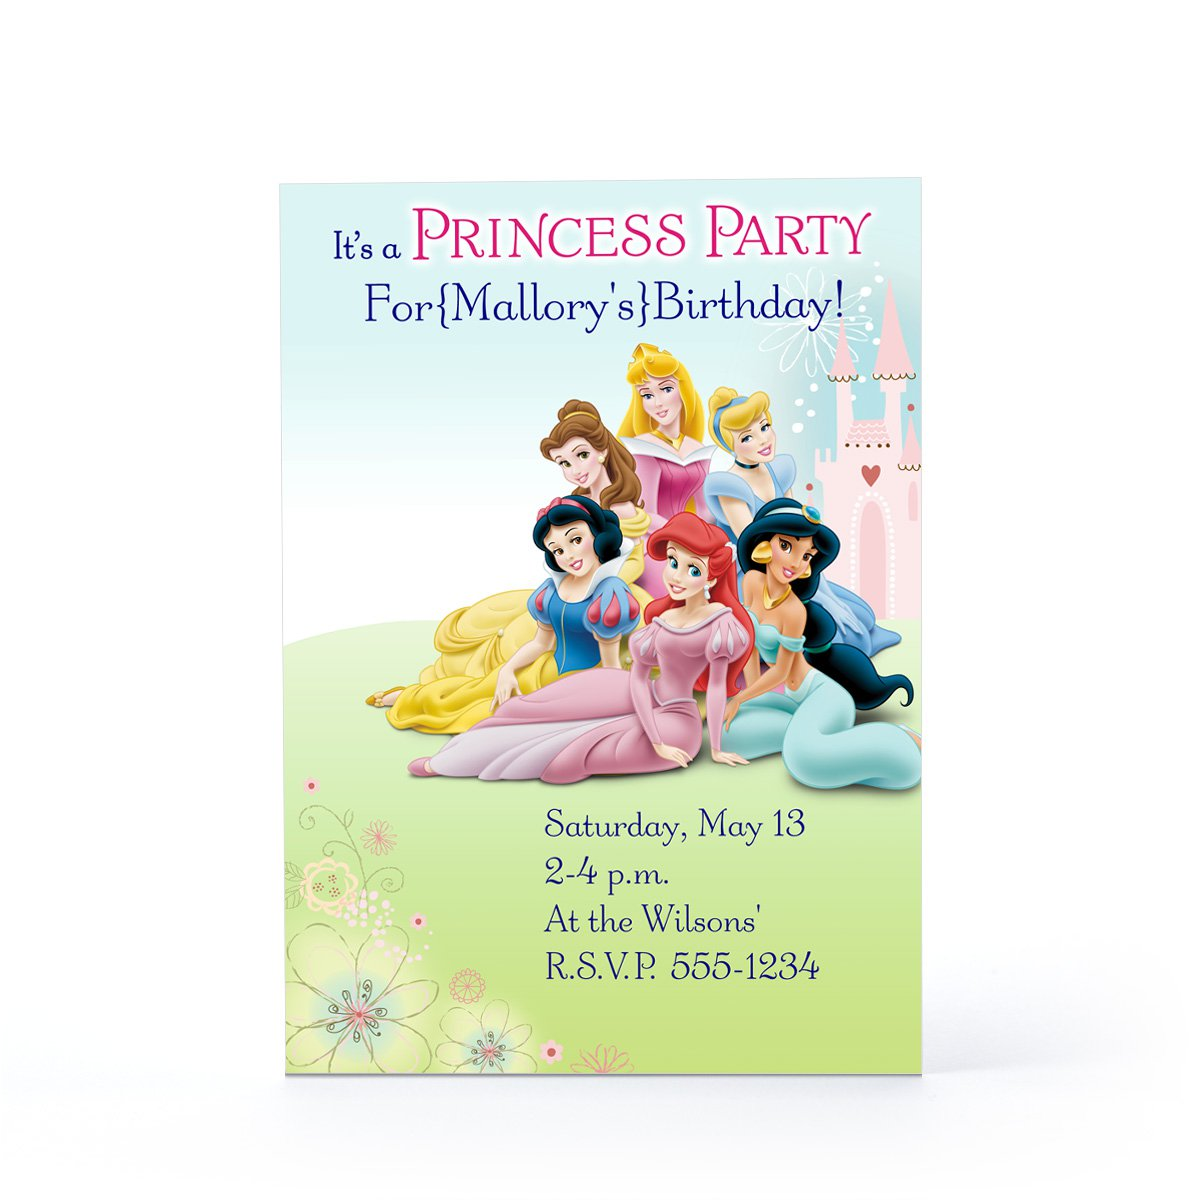 Cards Printable Birthday Invitation - Free printable hallmark birthday invitation cards